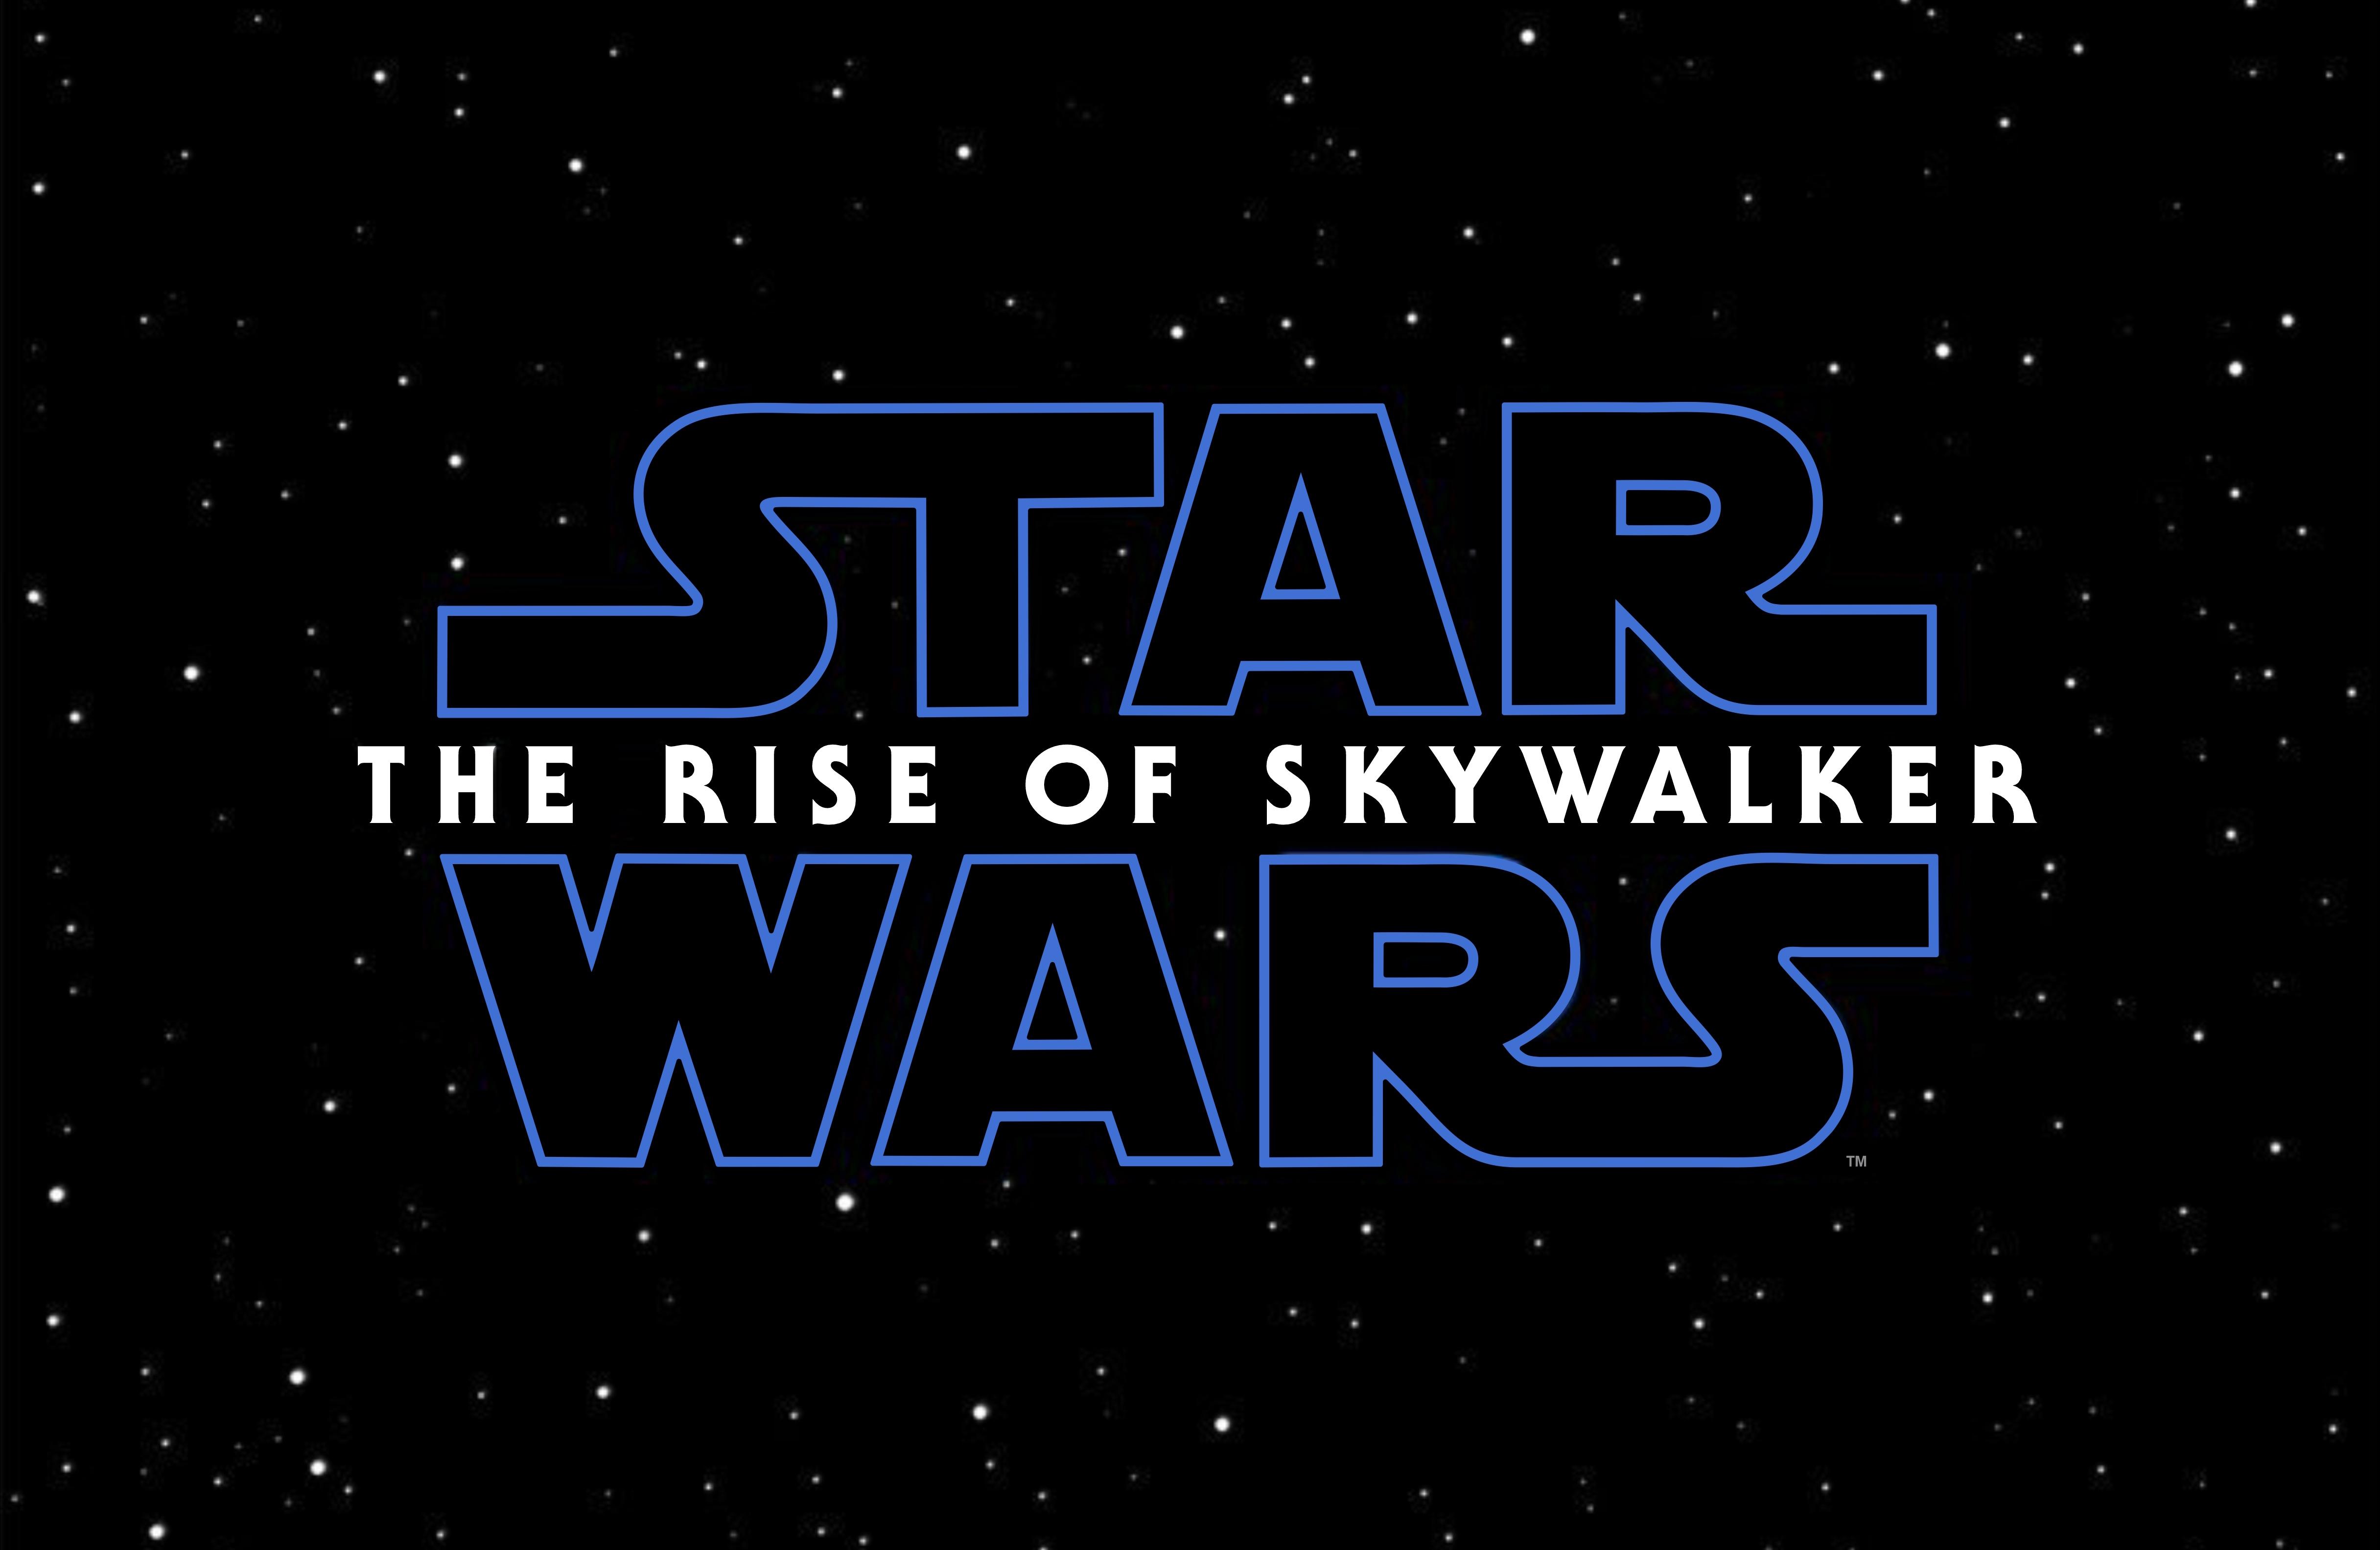 Star Wars Movie Logo Episode Ix On A Black Background Wallpapers